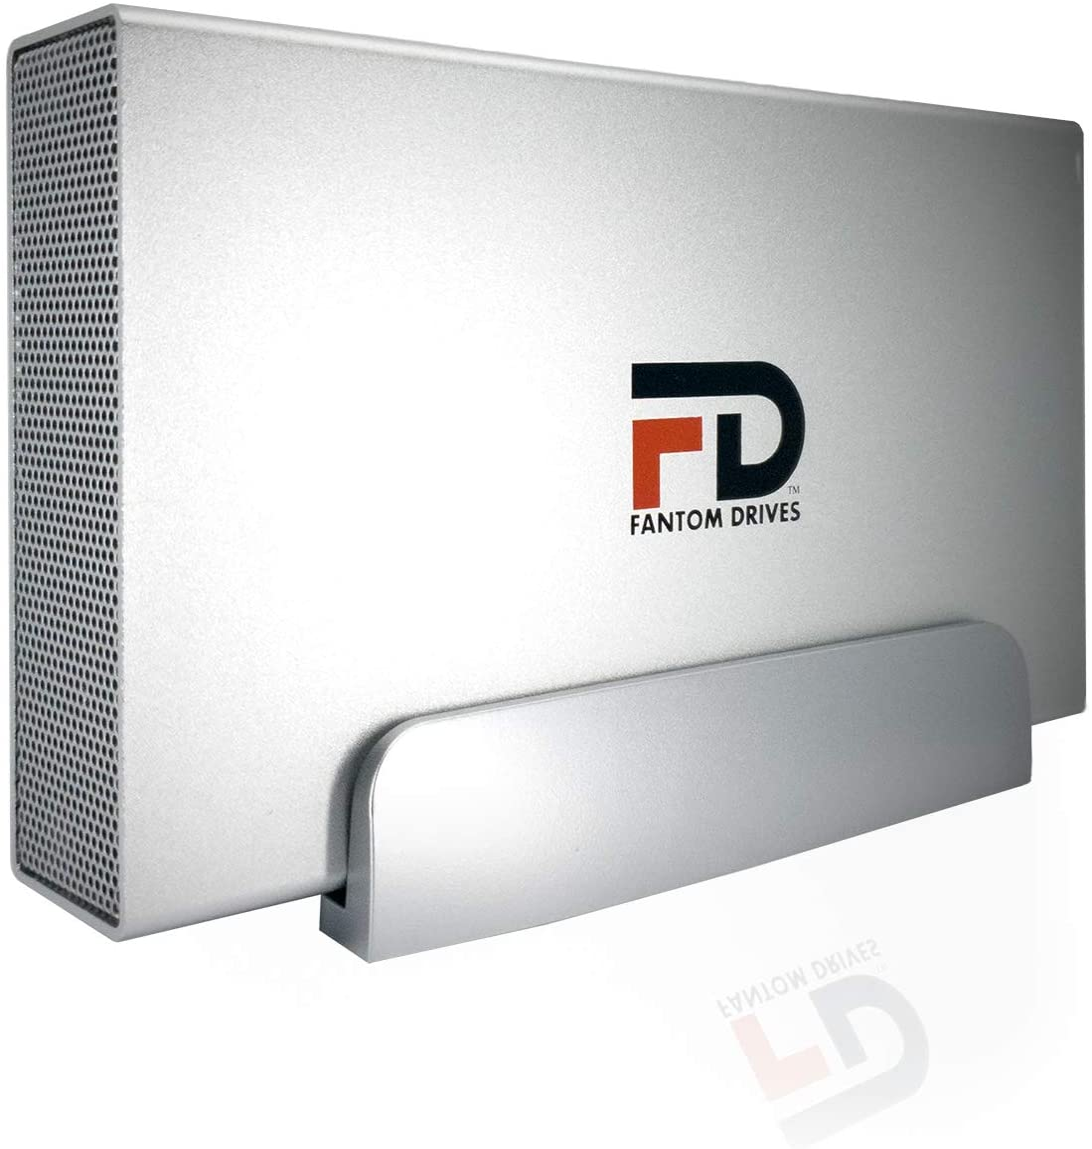 Fantom Drives 5TB 7200RPM External Hard Drive - USB 3.2 Gen 1 - 5Gbps - GForce 3 Aluminum - Silver - Compatible with Mac/Windows/PS4/Xbox (GF3S5000UP) by Fantom Drives